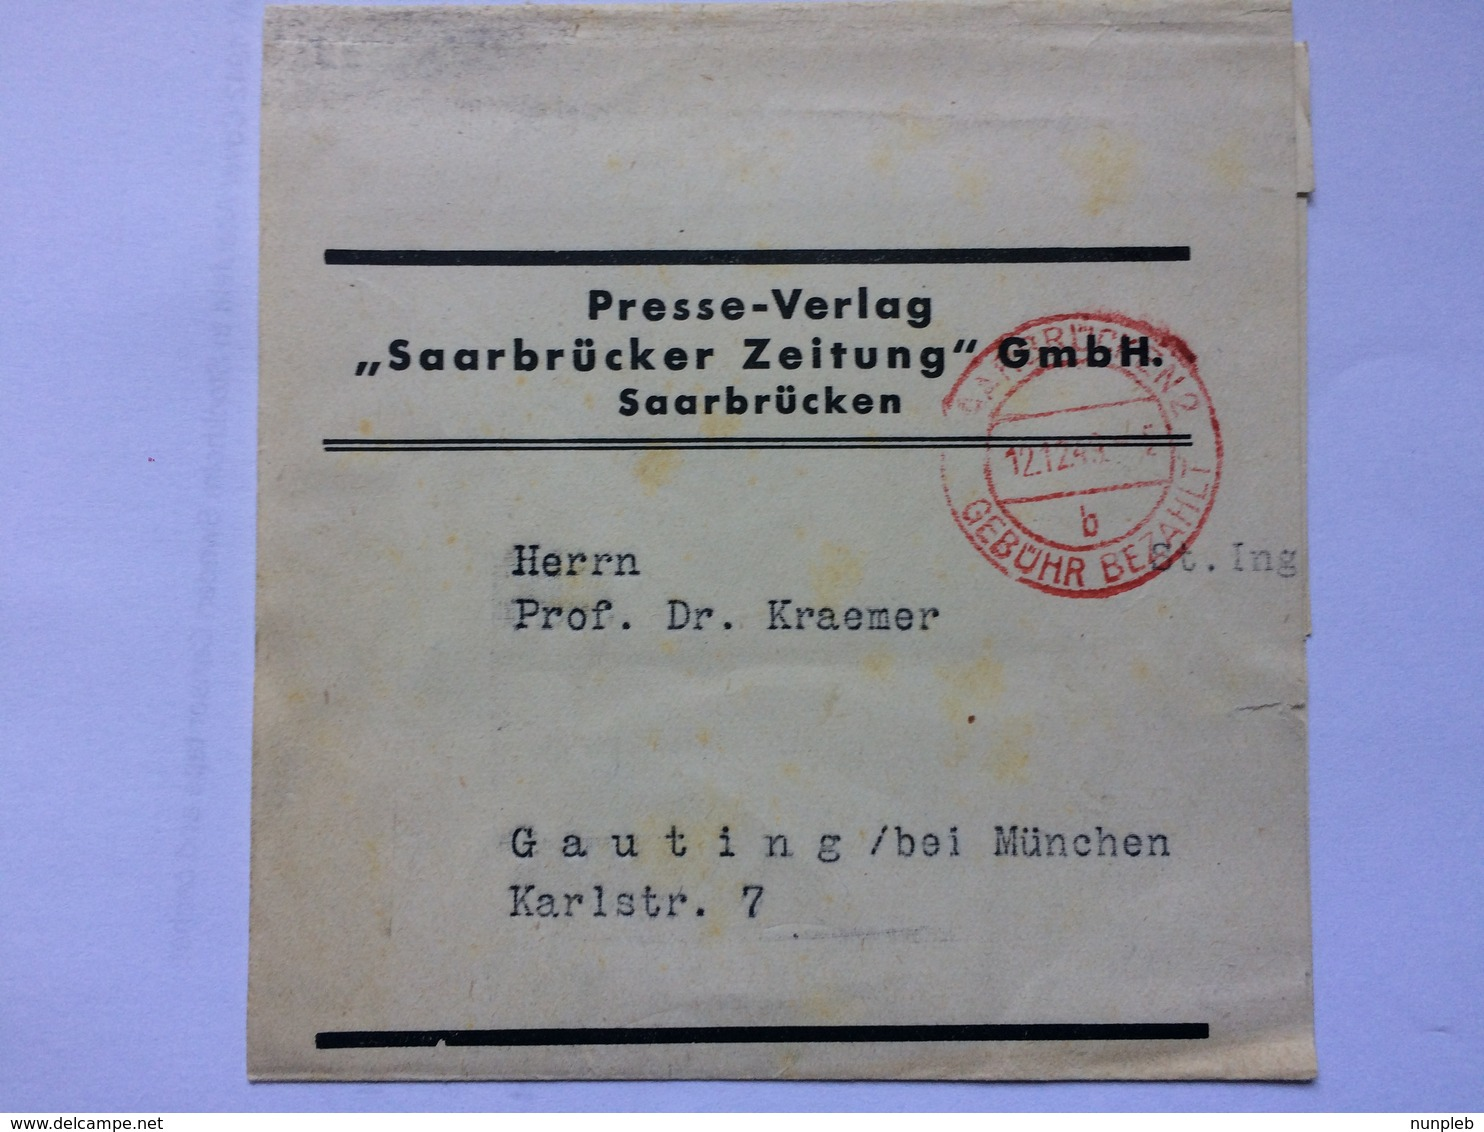 GERMANY 1944 Newspaper Wrapper Saarbrucken To Gauting With Gebuhr Bezahlt Mark - Deutschland